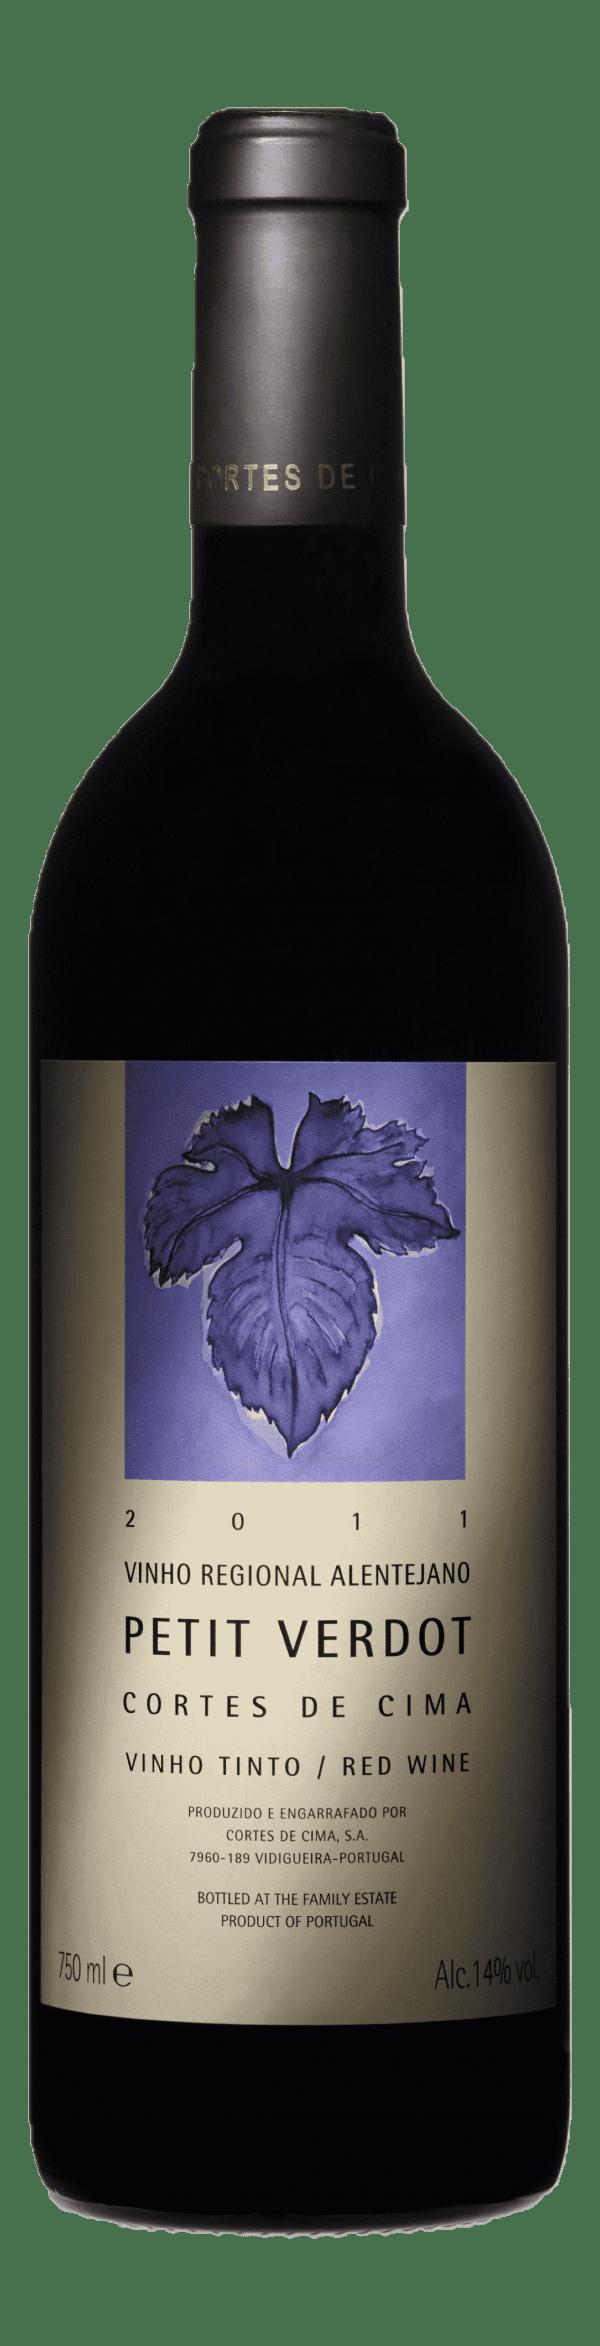 Portugalské víno Cortes de Cima Petit Verdot na eshopu vín z Portugalska